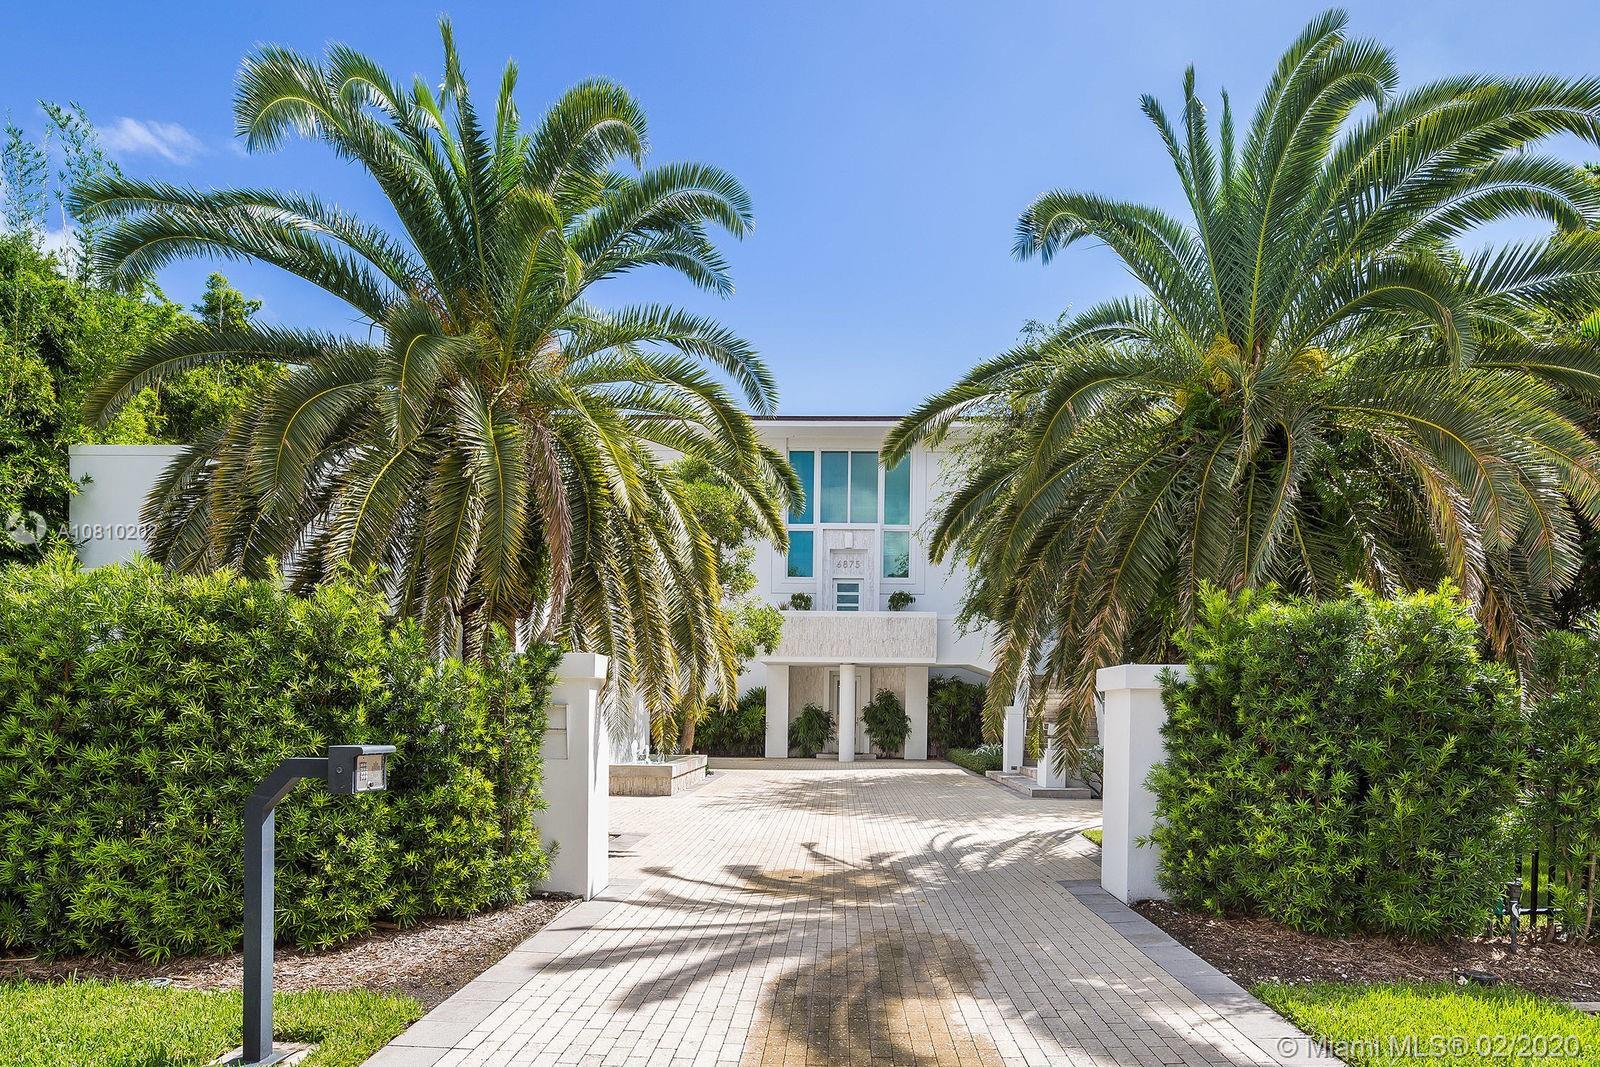 6875 Sunrise Dr Luxury Real Estate